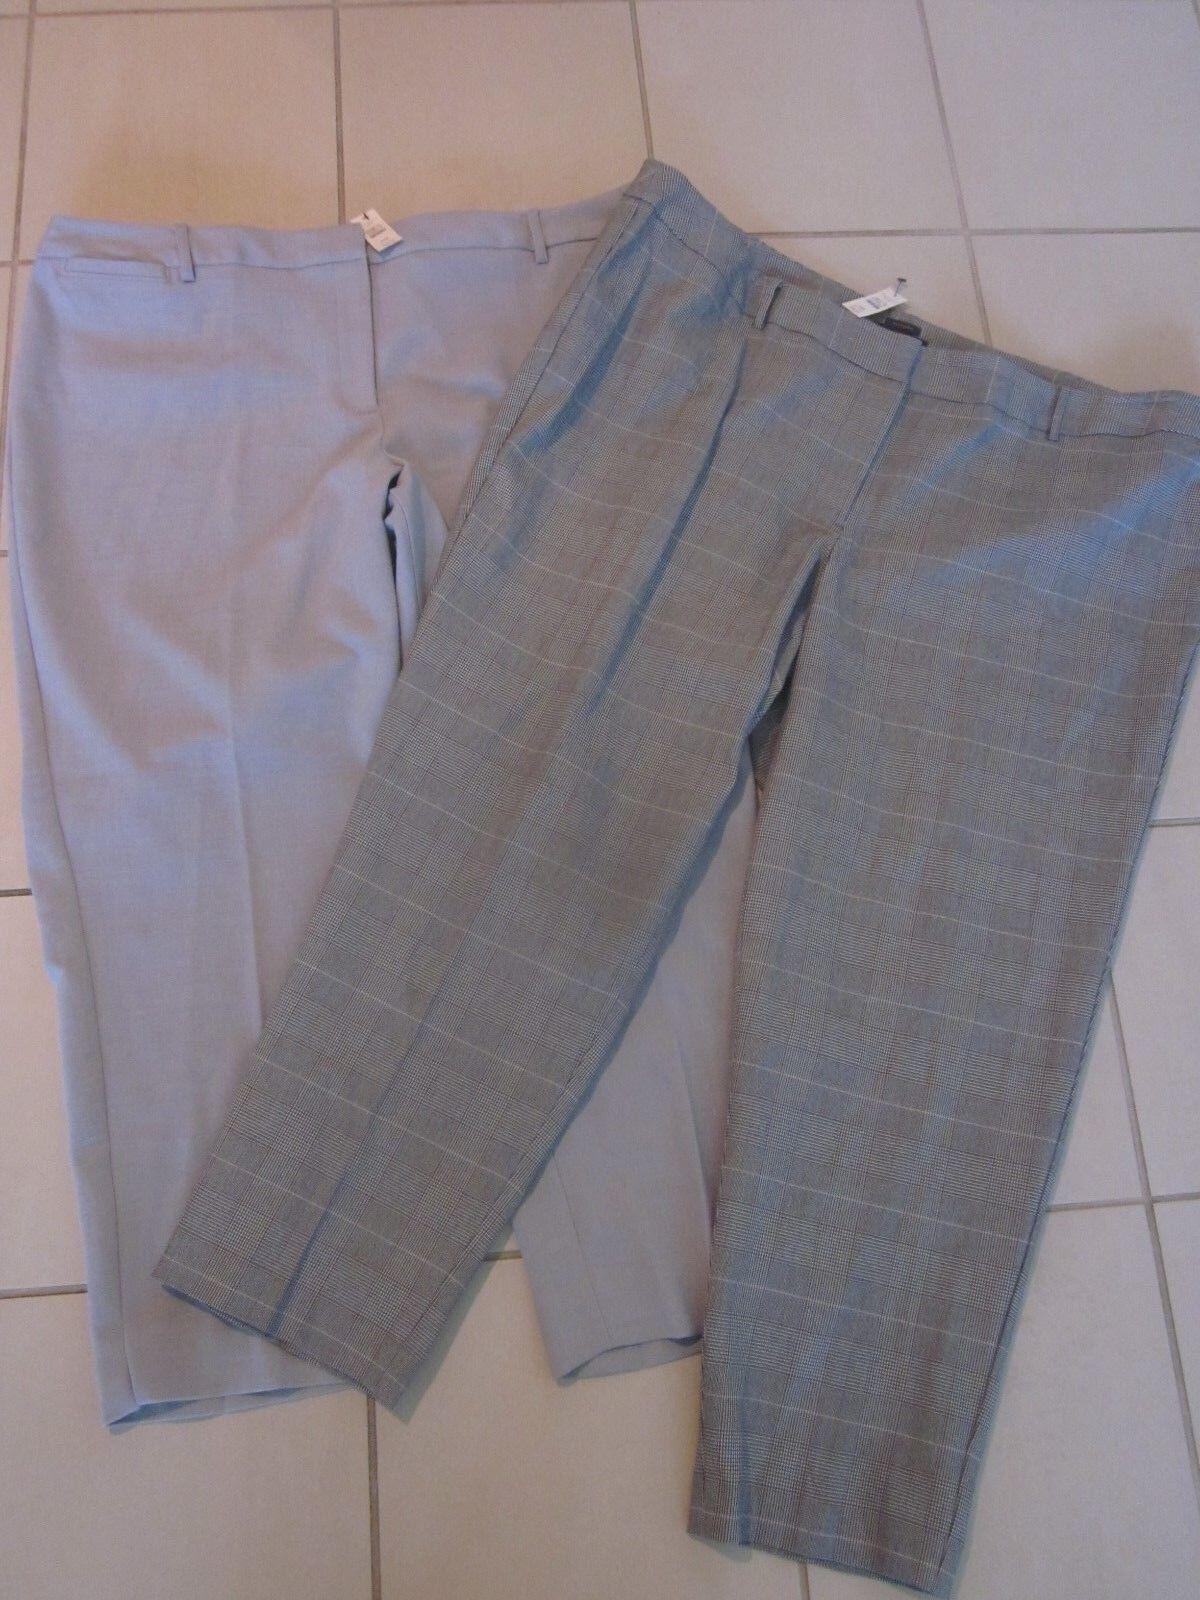 TALBOTS Grey Herringbone Dress Pants LOT OF 2  228 Hampshire Size 24W NWT